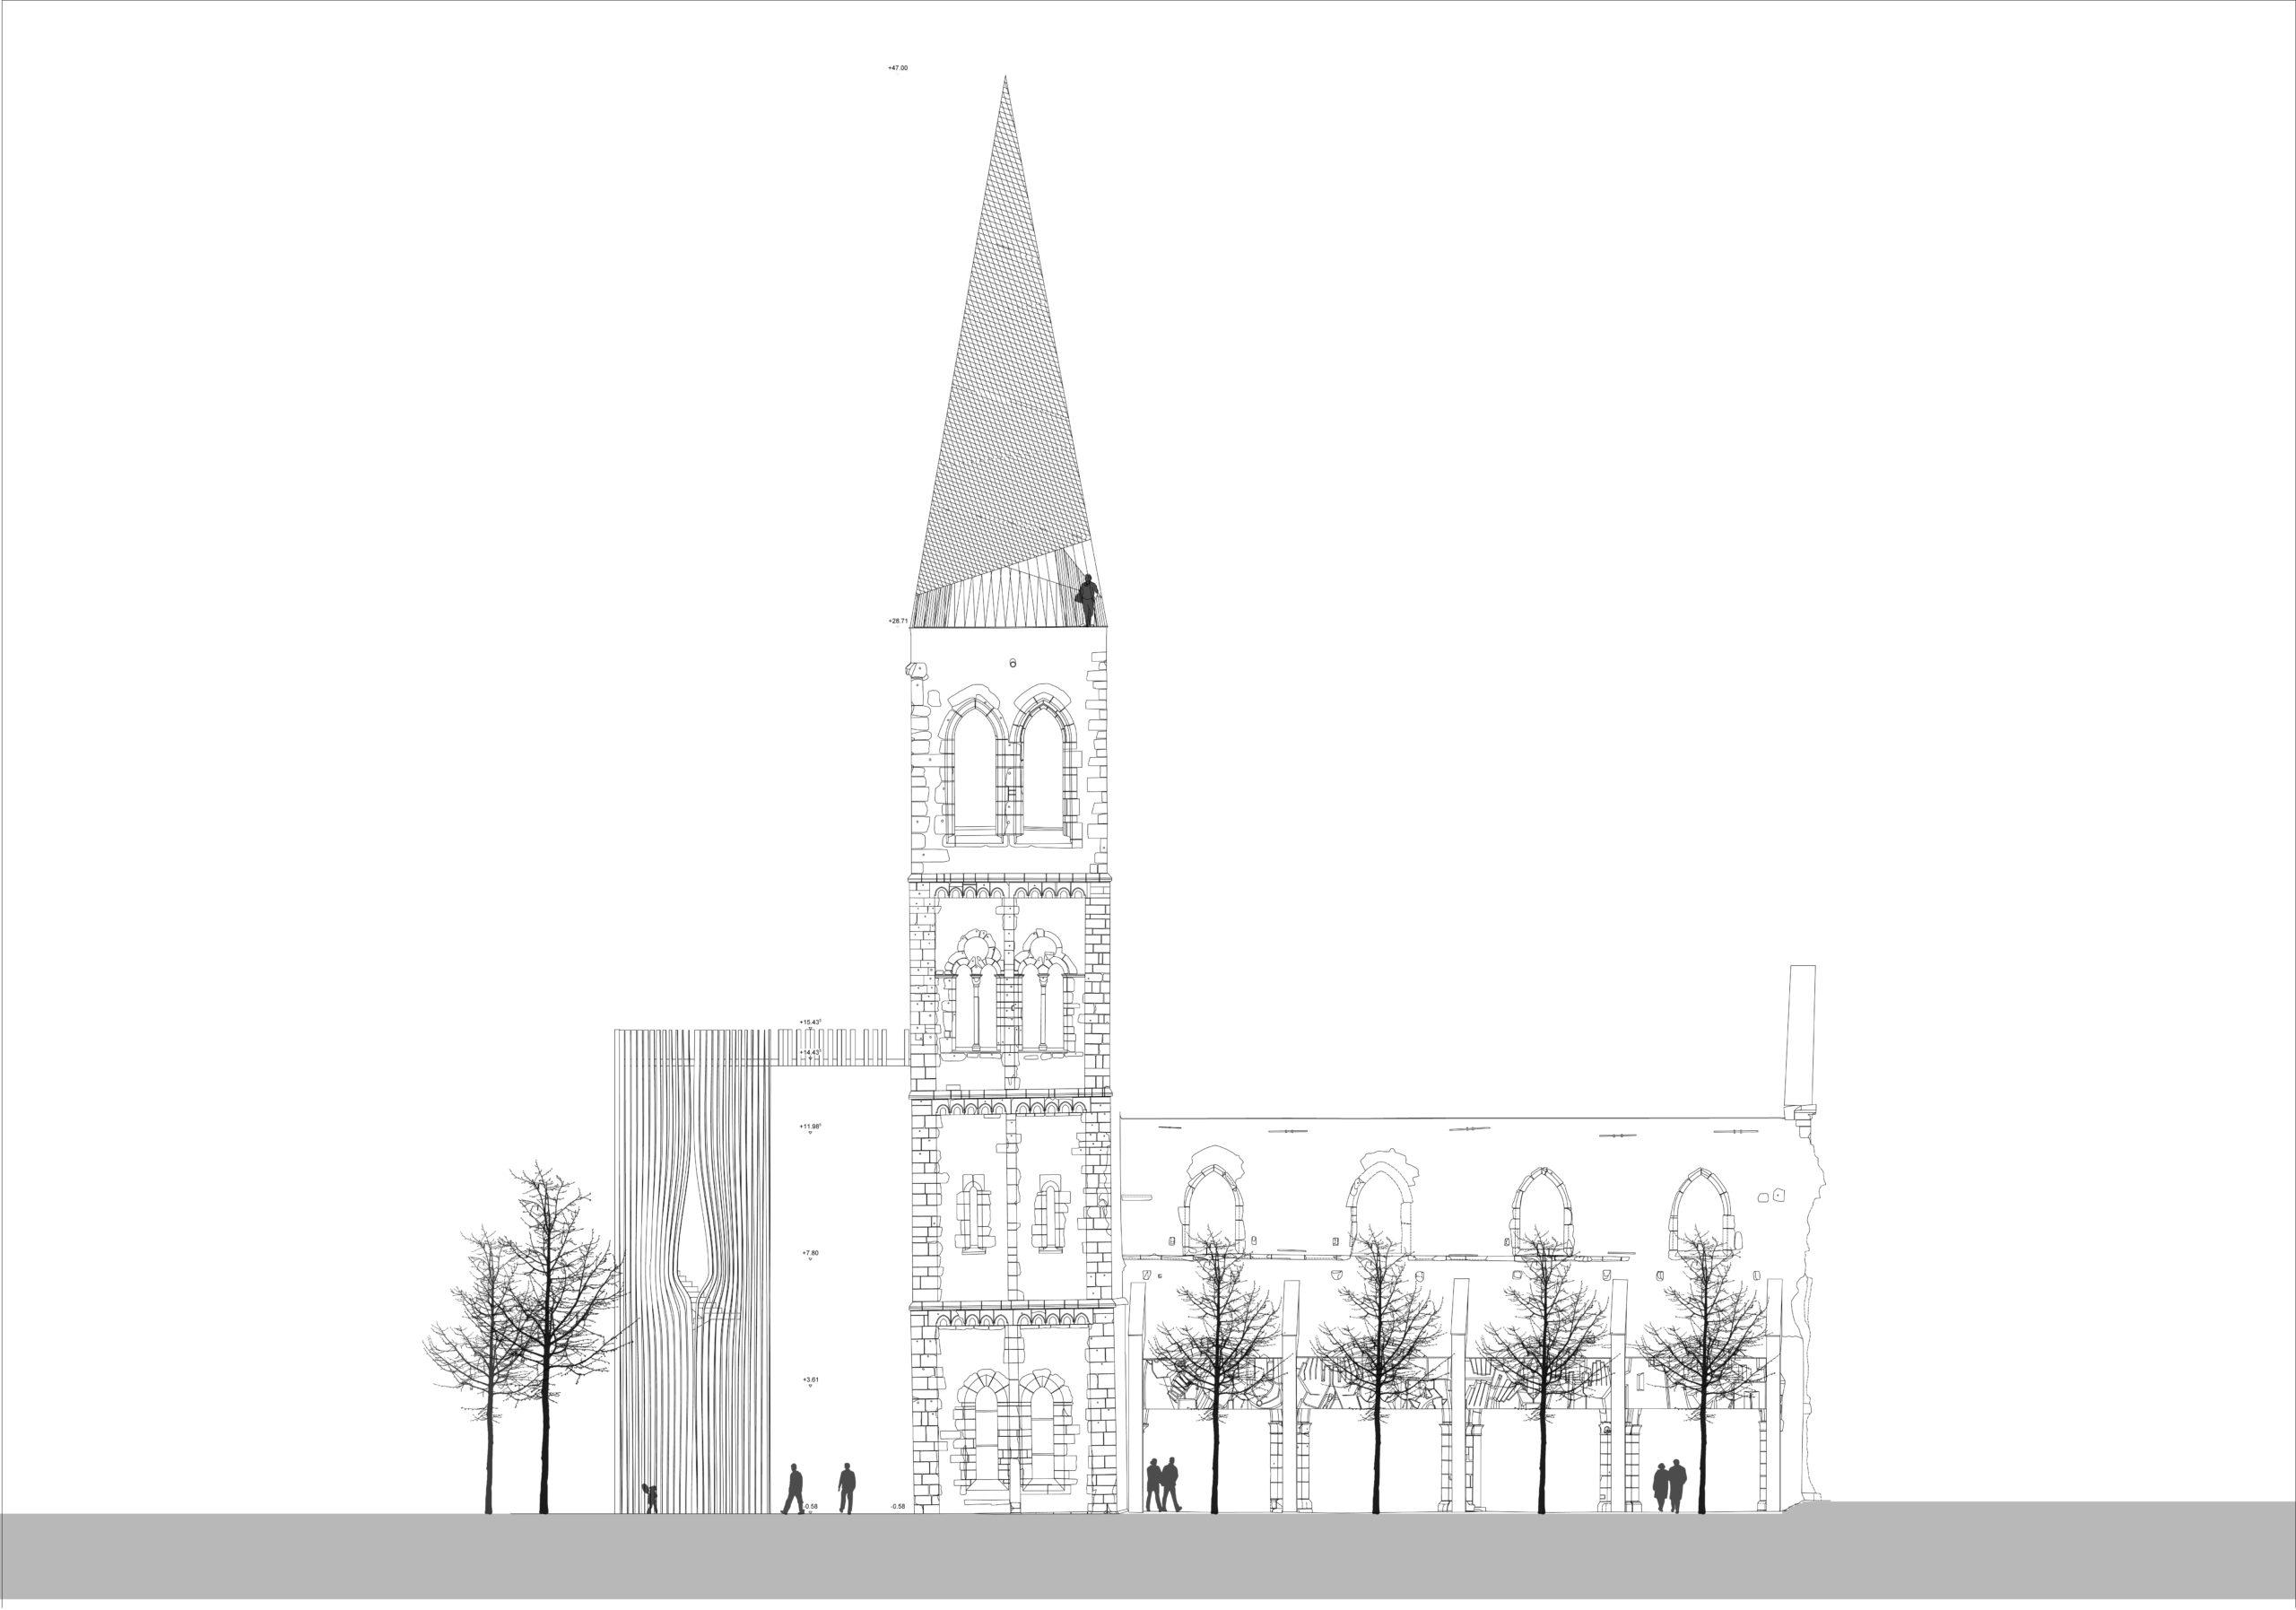 Gedenkstätte St. Christoph, Mainz Sanierung Entwurf Turm